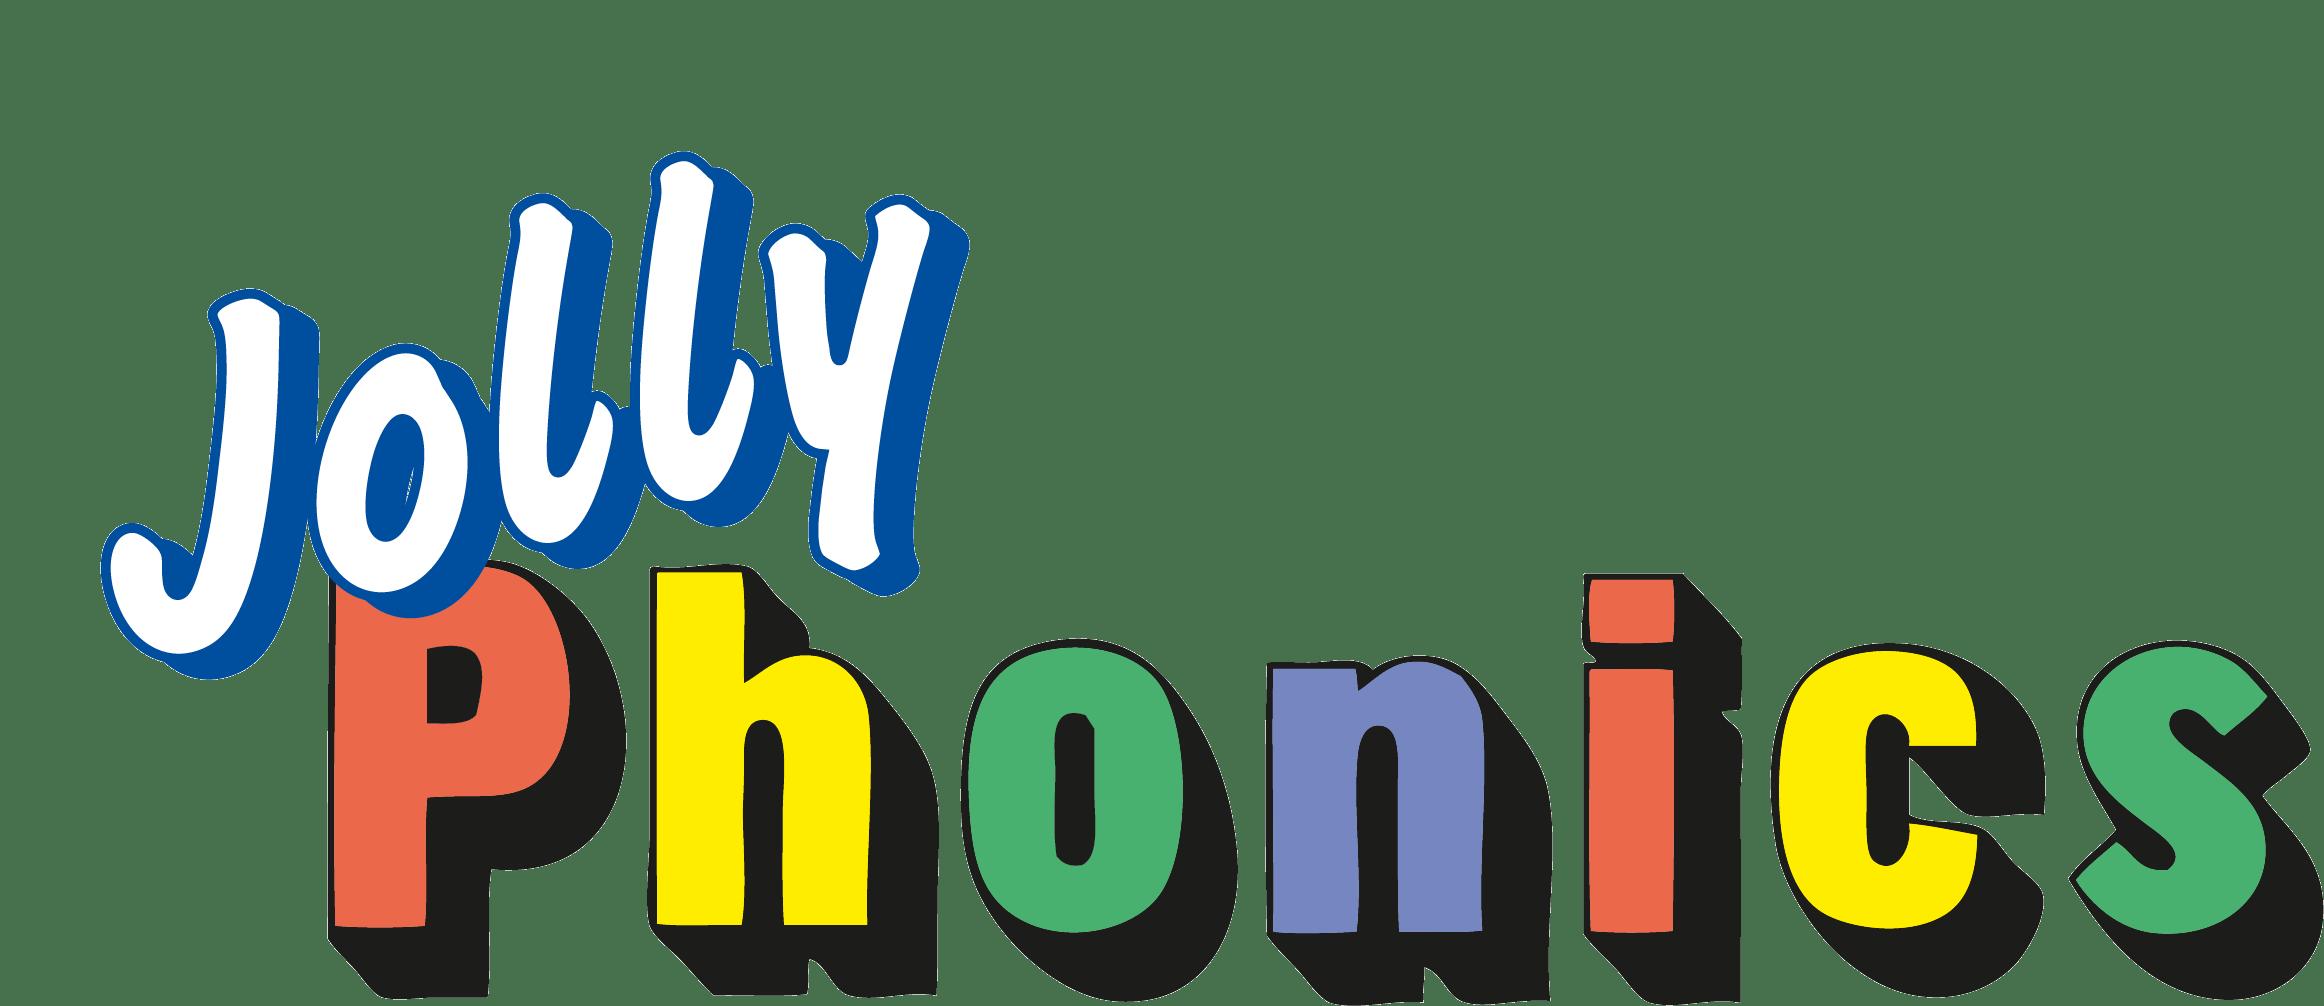 Spelling Clipart Phonics Spelling Phonics Transparent